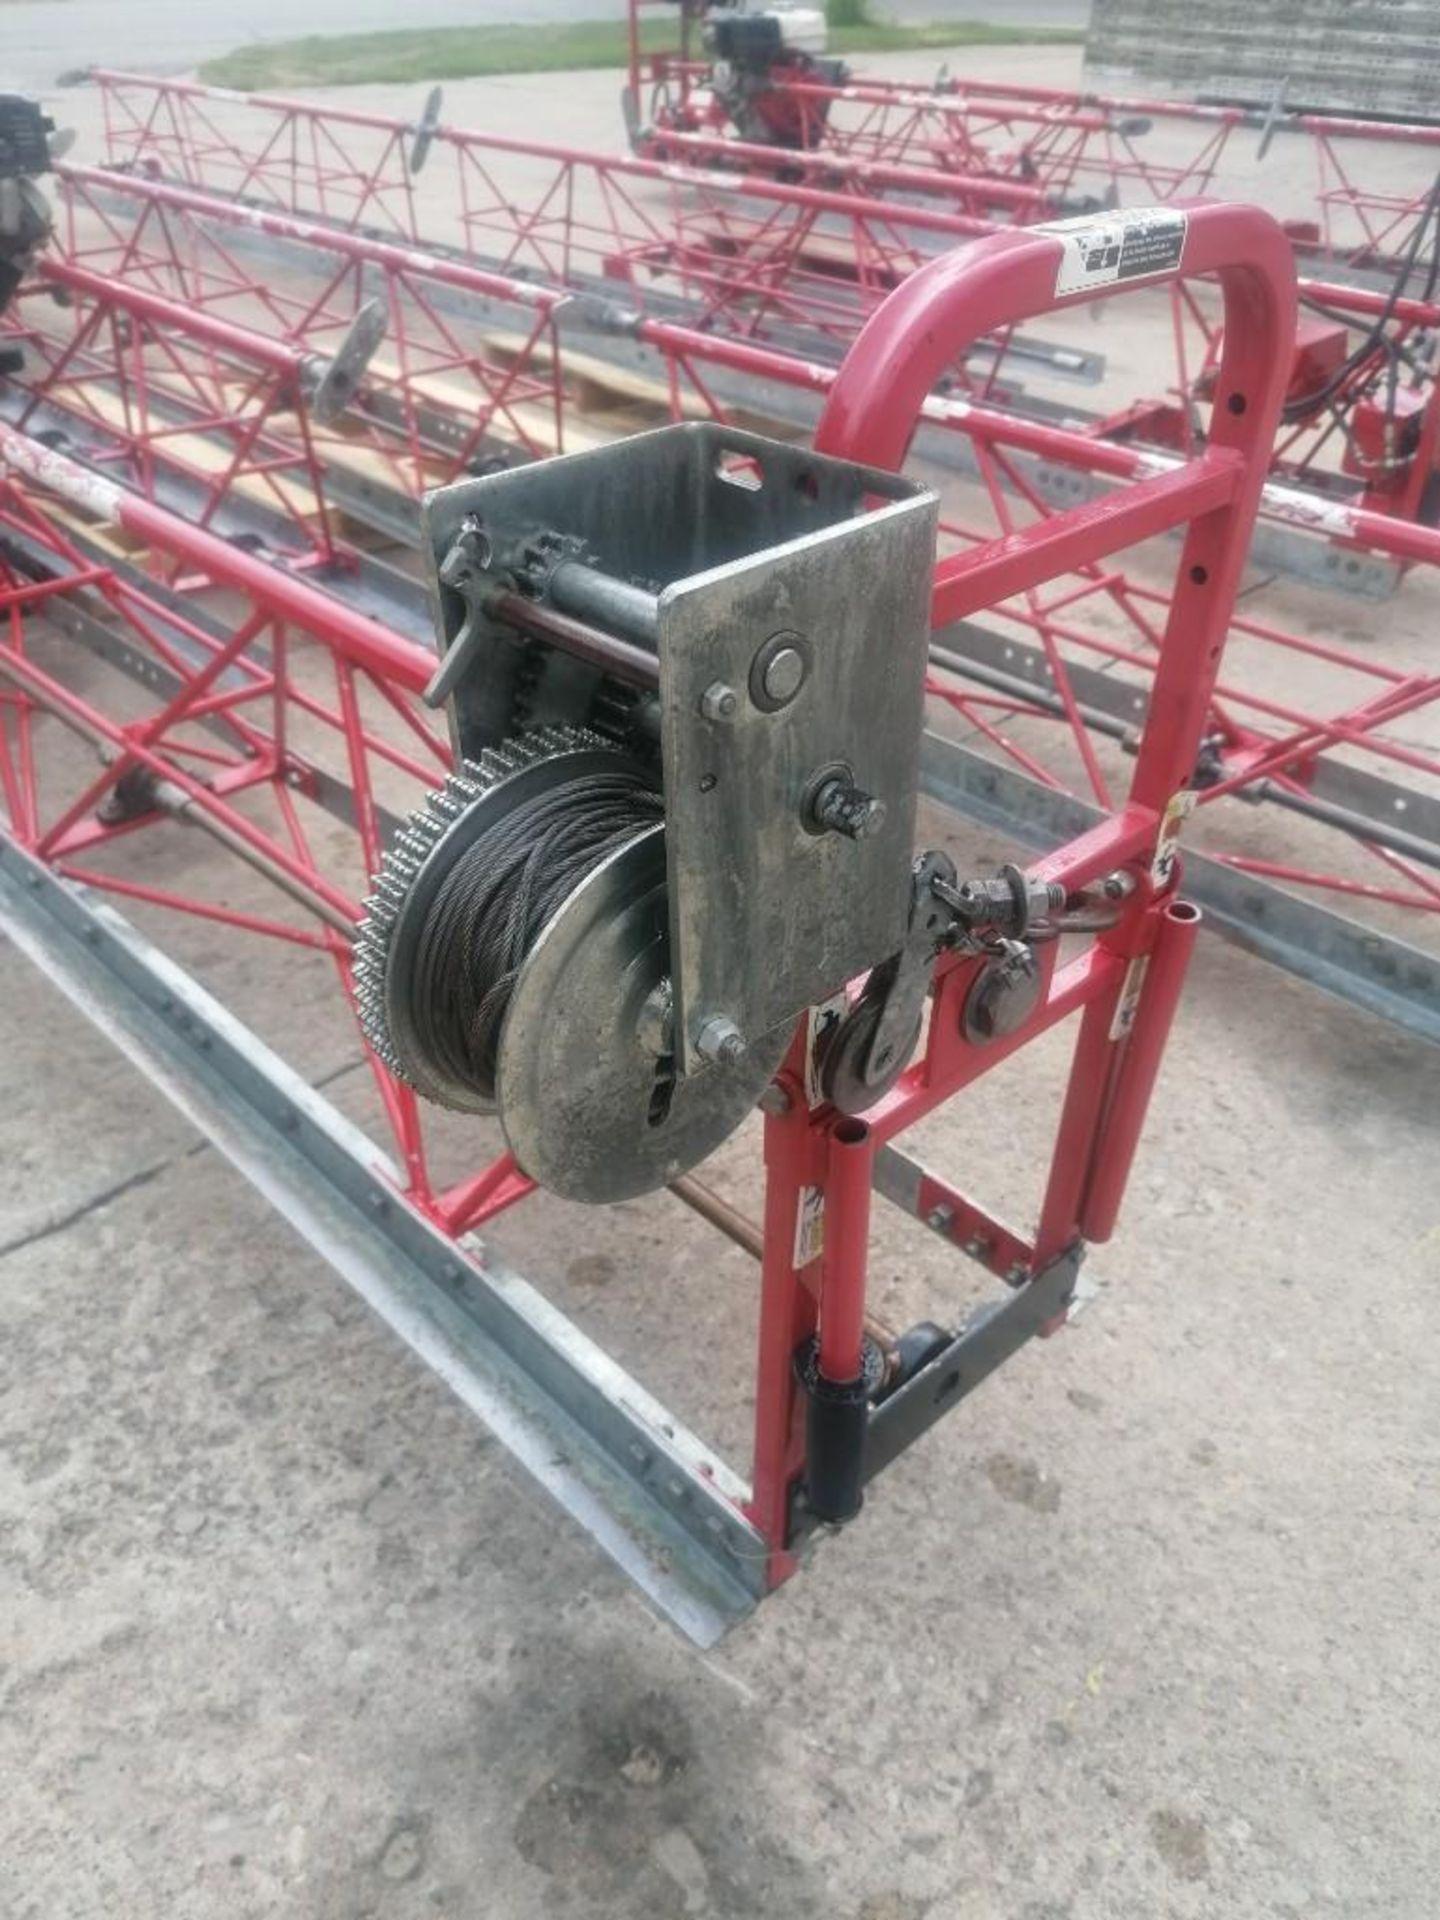 Lot 670 - 56' Allen Razorback Hydraulic Truss Screed with Honda GX270 Engine. Located at 301 E Henry Street,